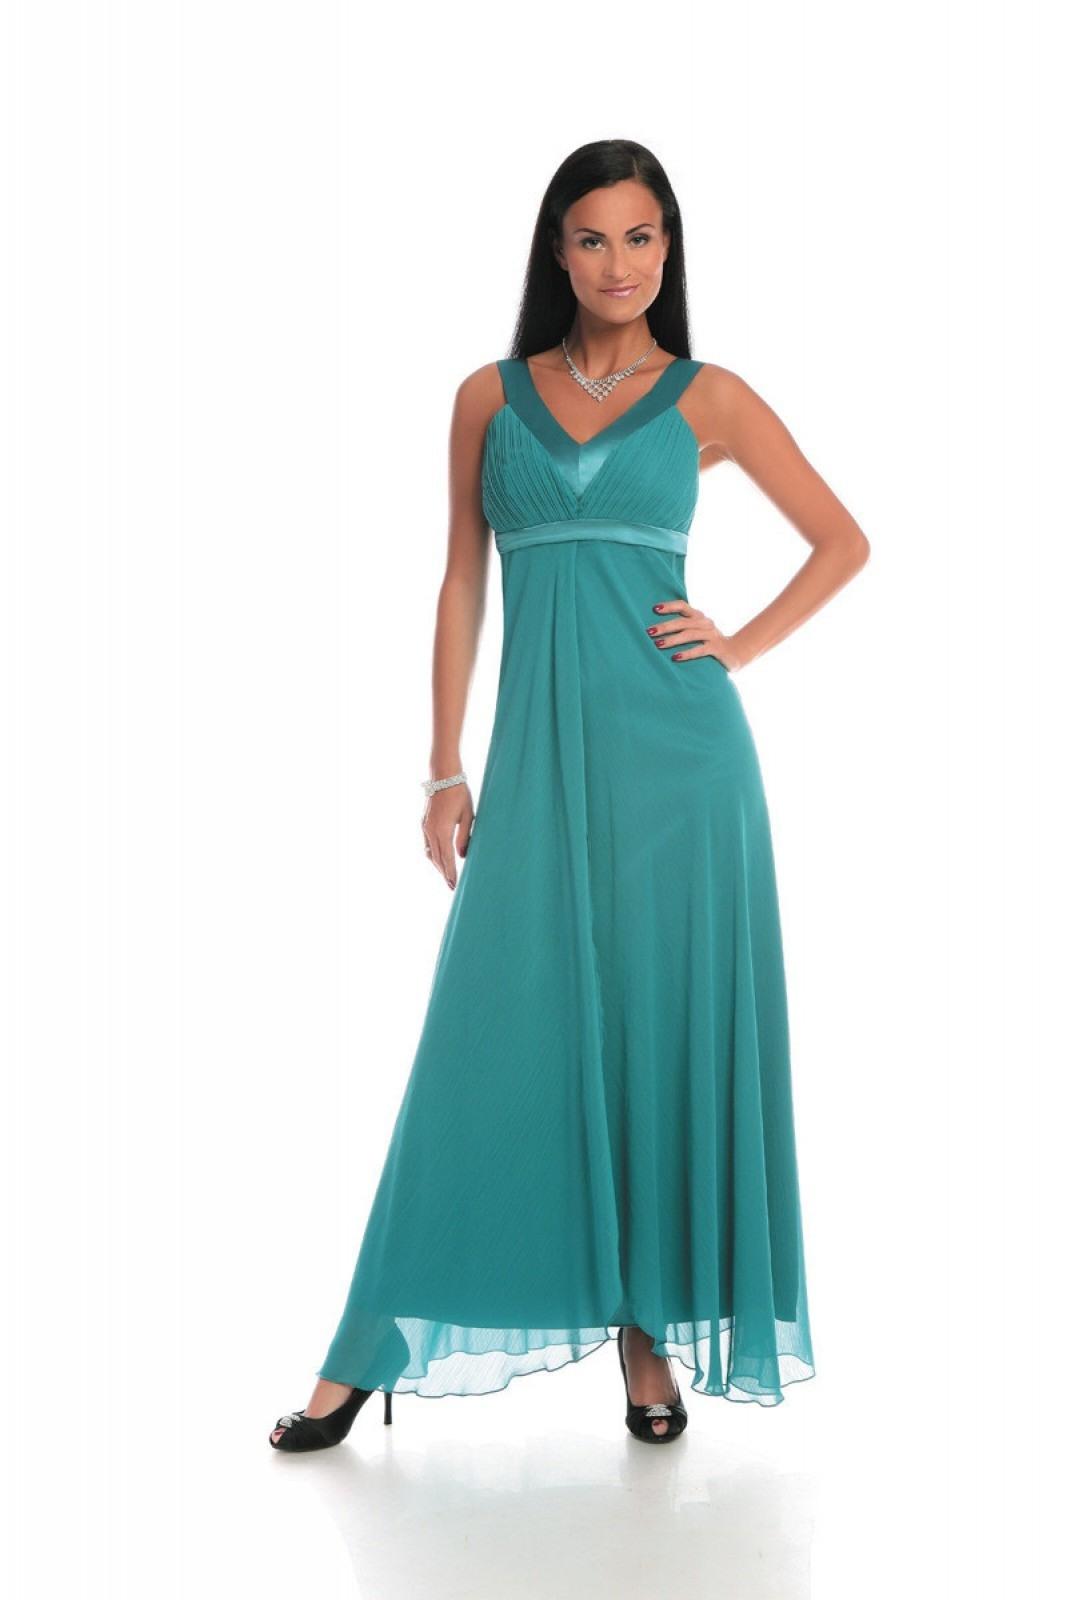 Formal Schön Türkises Langes Kleid Ärmel13 Cool Türkises Langes Kleid Bester Preis